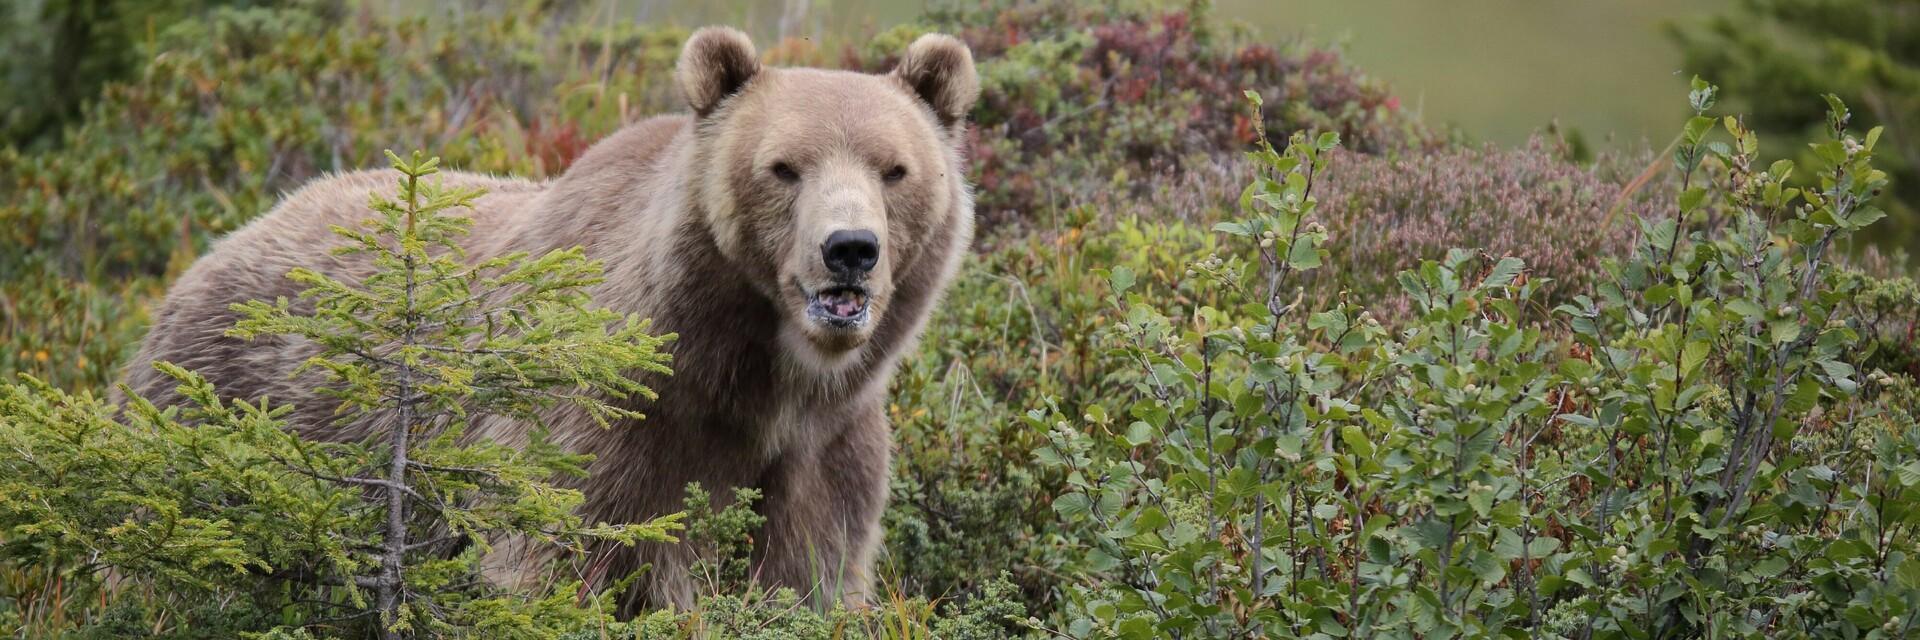 Bear Napa in sanctuary